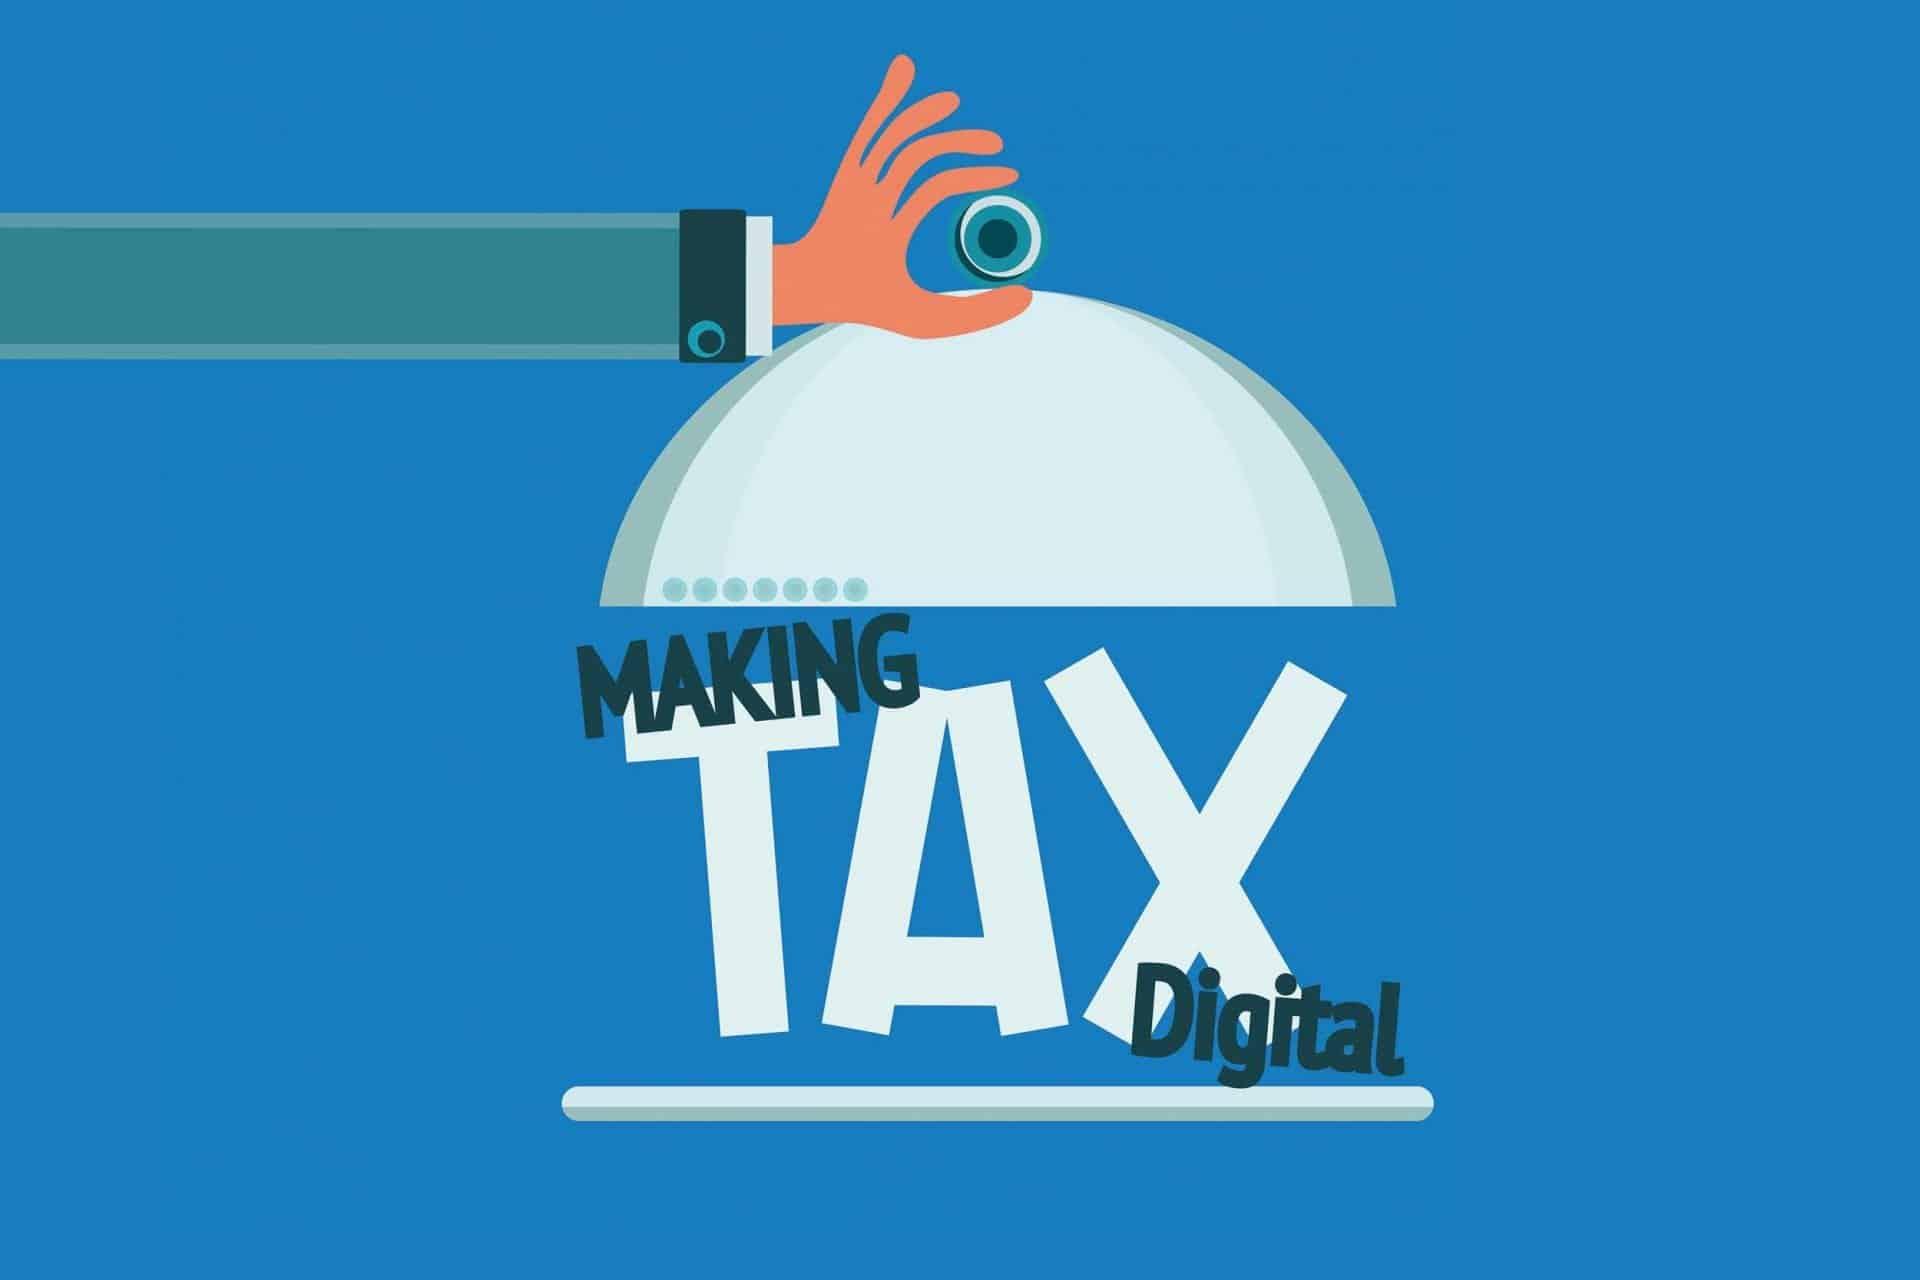 Making Tax Digital – 10 Myths Debunked